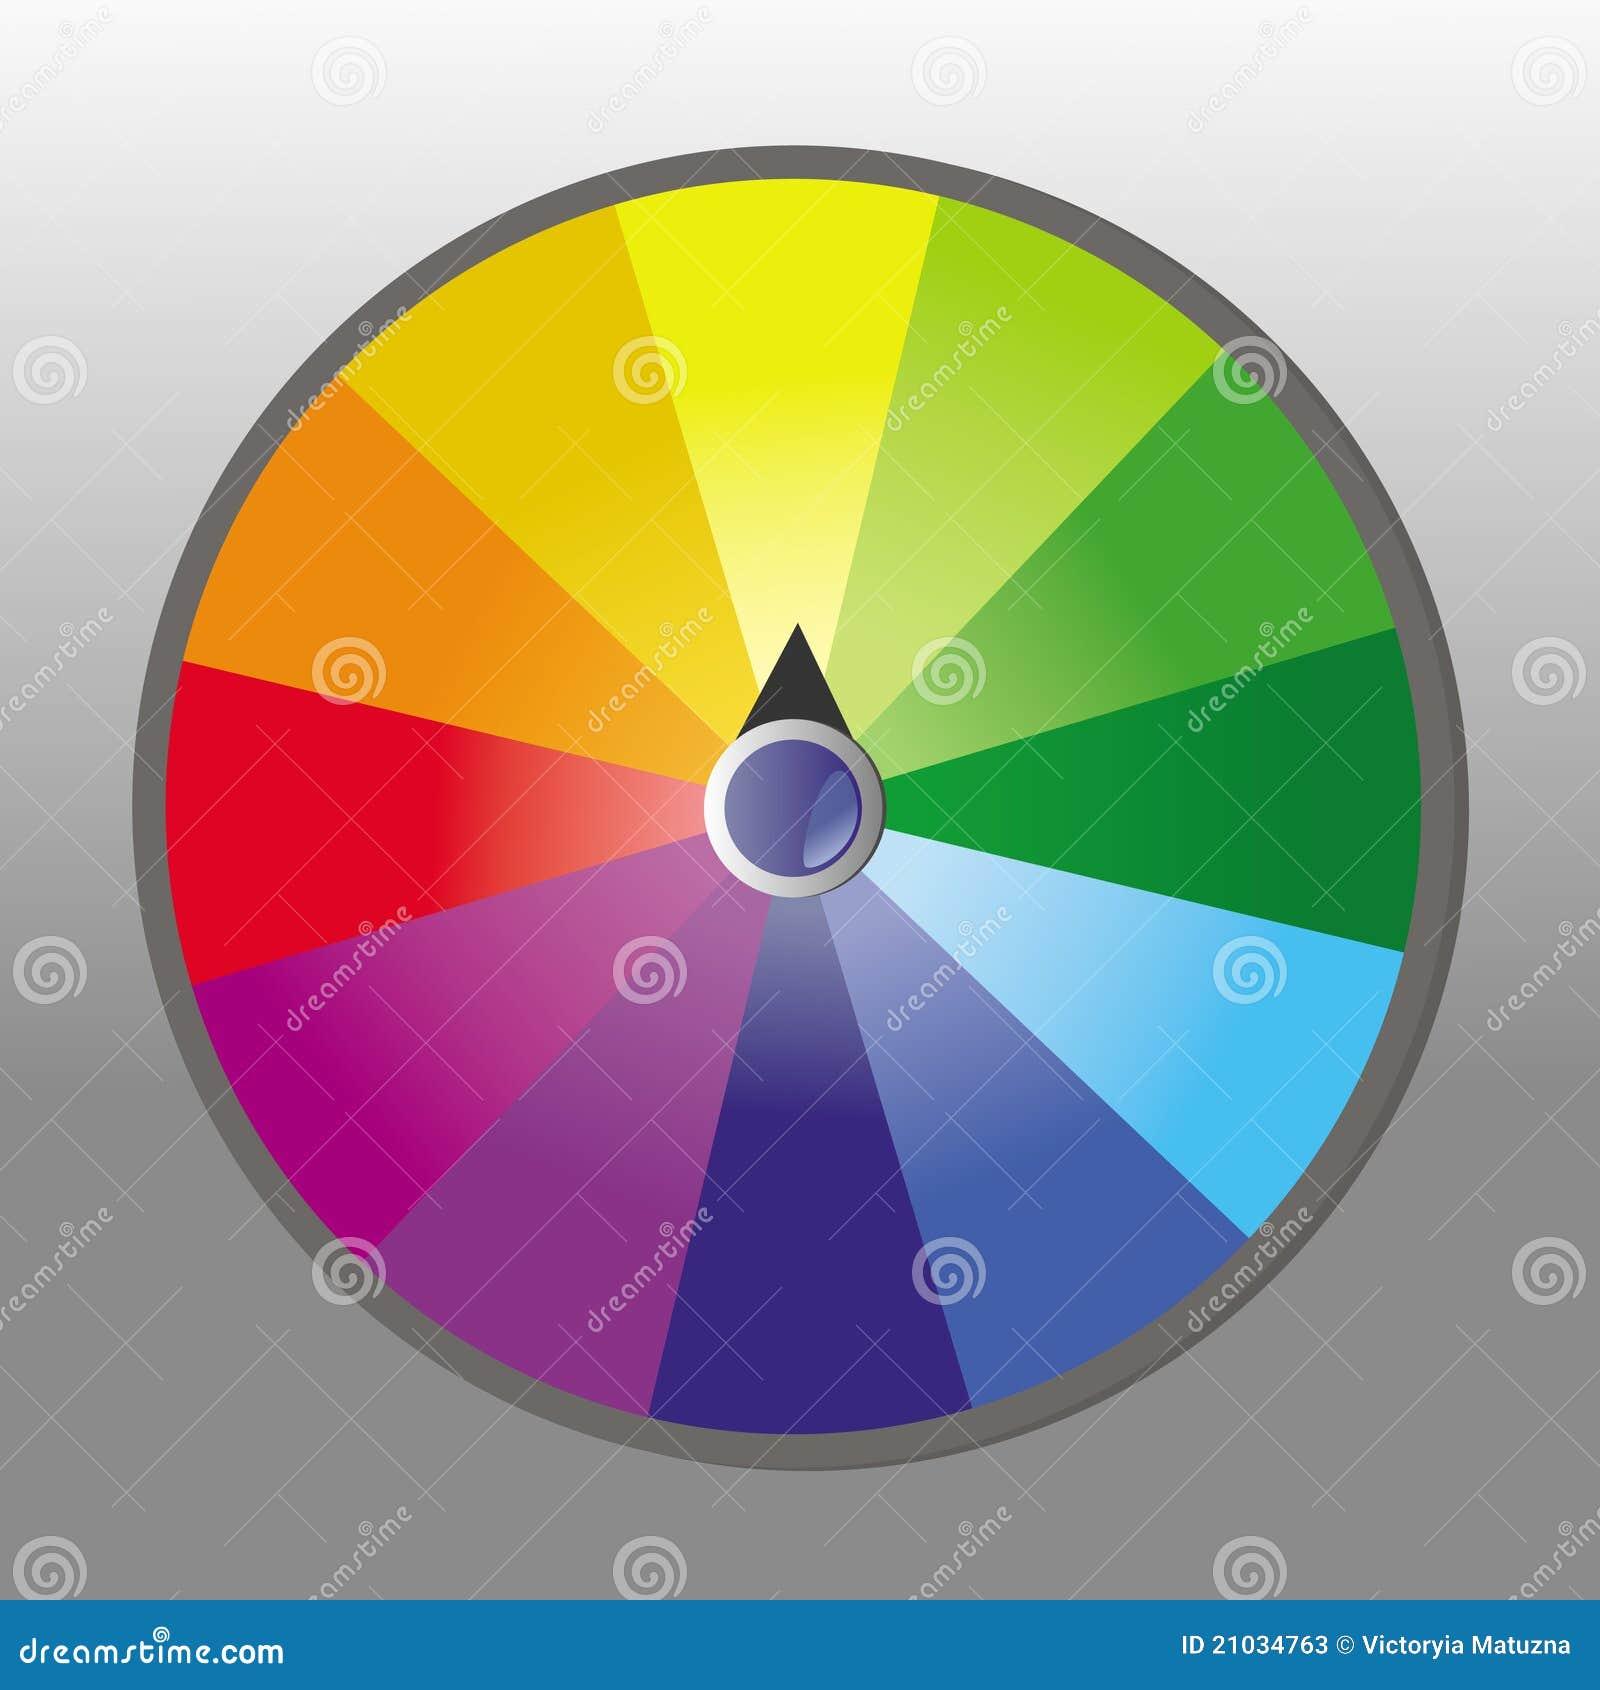 Wheel Of Fortune. Vector Illustration. Stock Vector ...